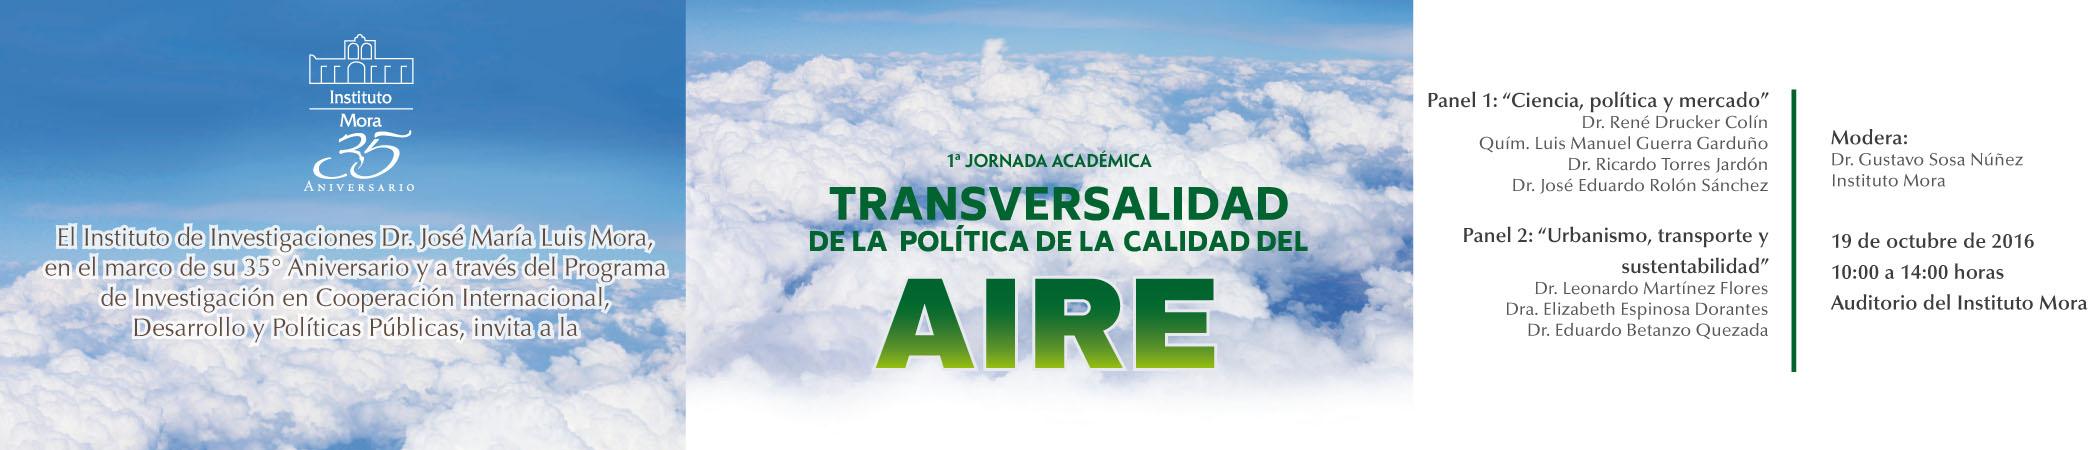 1ª Jornada Académica Transversalidad de la Política de la Calidad del Aire